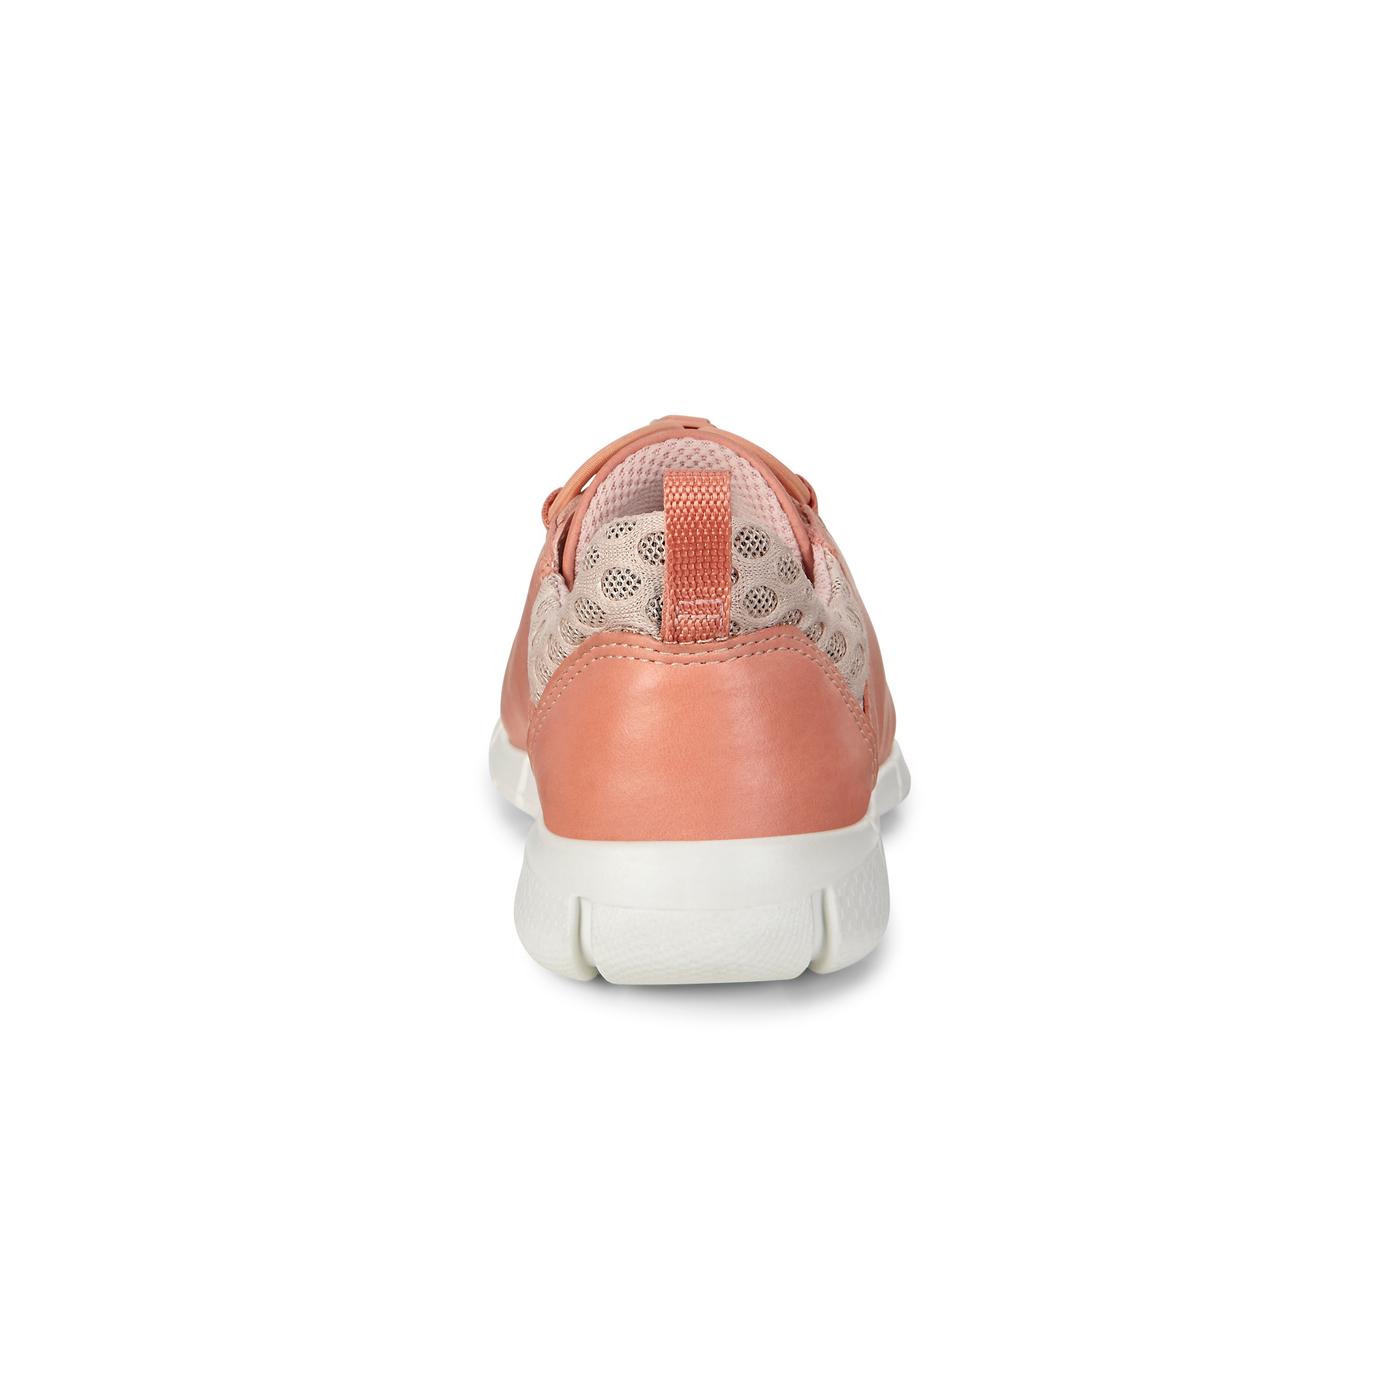 ECCO INTRINSIC SNEAKER Shoe